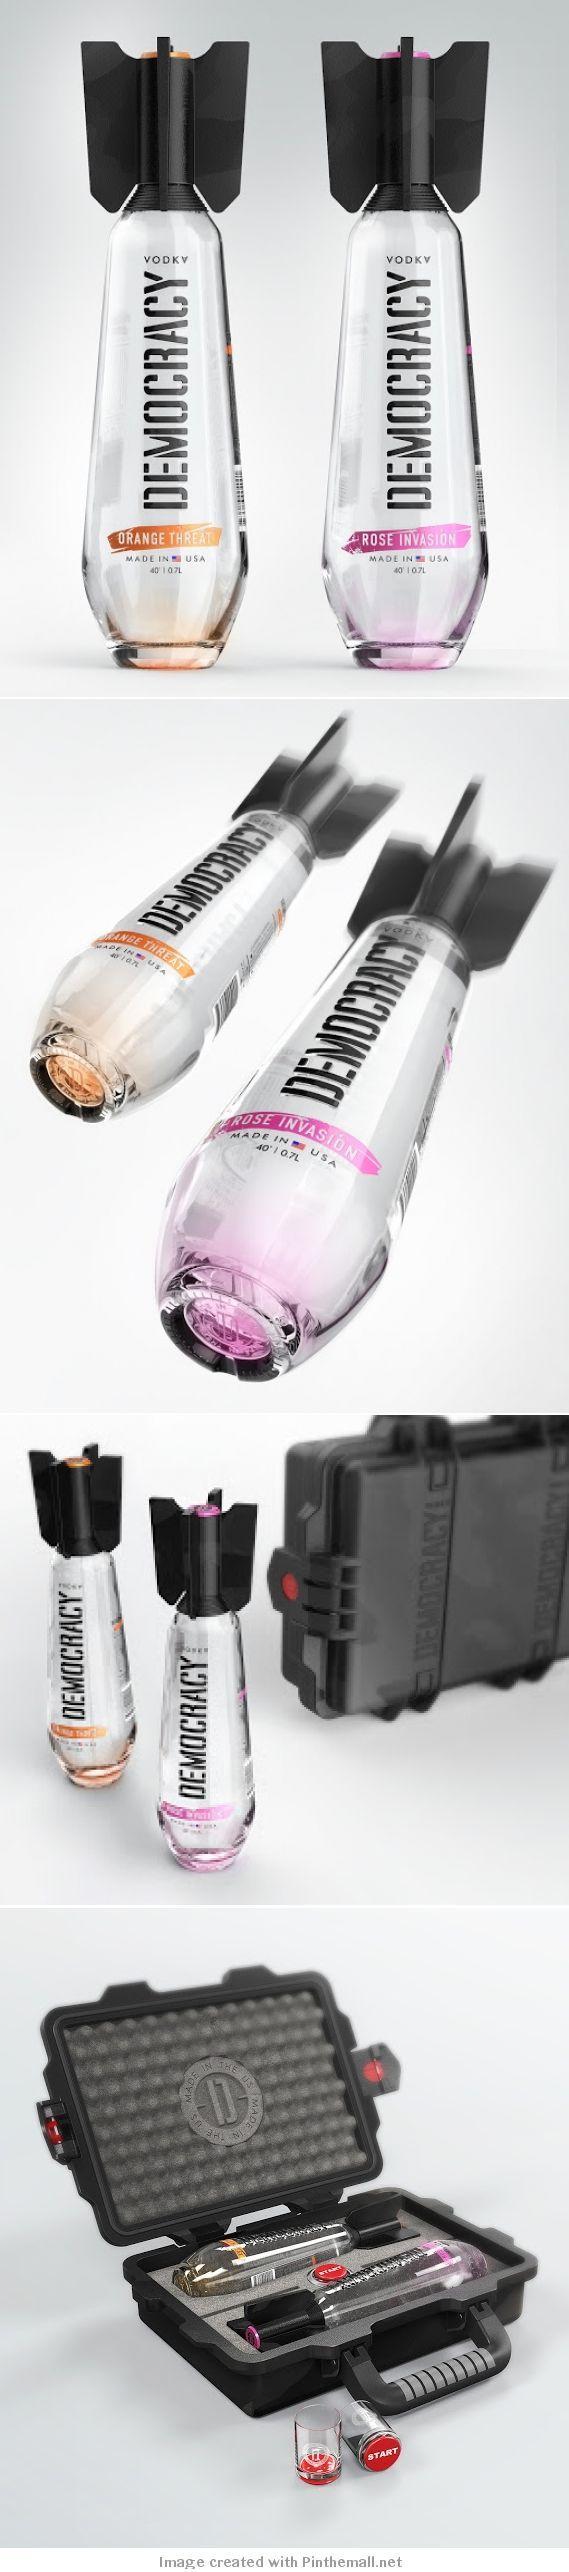 DEMOCRACY Vodka (Concept) Agency: STUDIOIN Designers: Arthur Schreiber, Galya Akhmetzyanova 3D: Maxim Kuliko